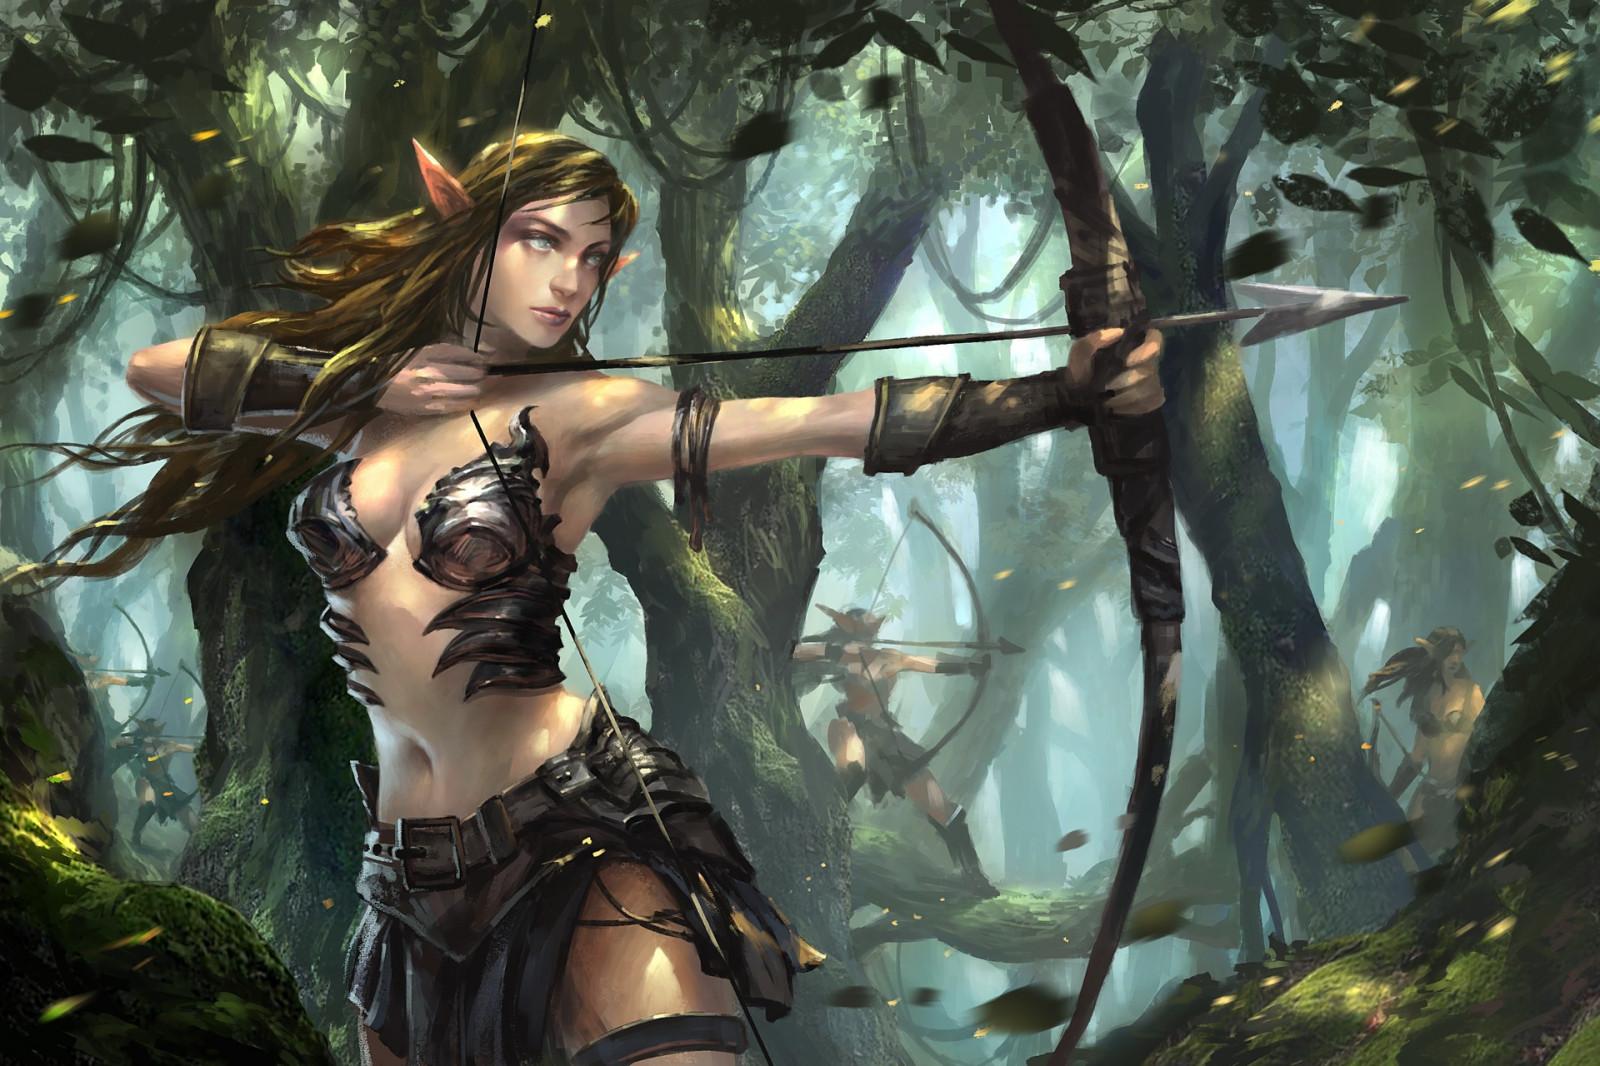 Archer Warrior Elves Fantasy Art Wallpapers Hd: Wallpaper : Fantasy Art, Anime, Archer, Jungle, Comics